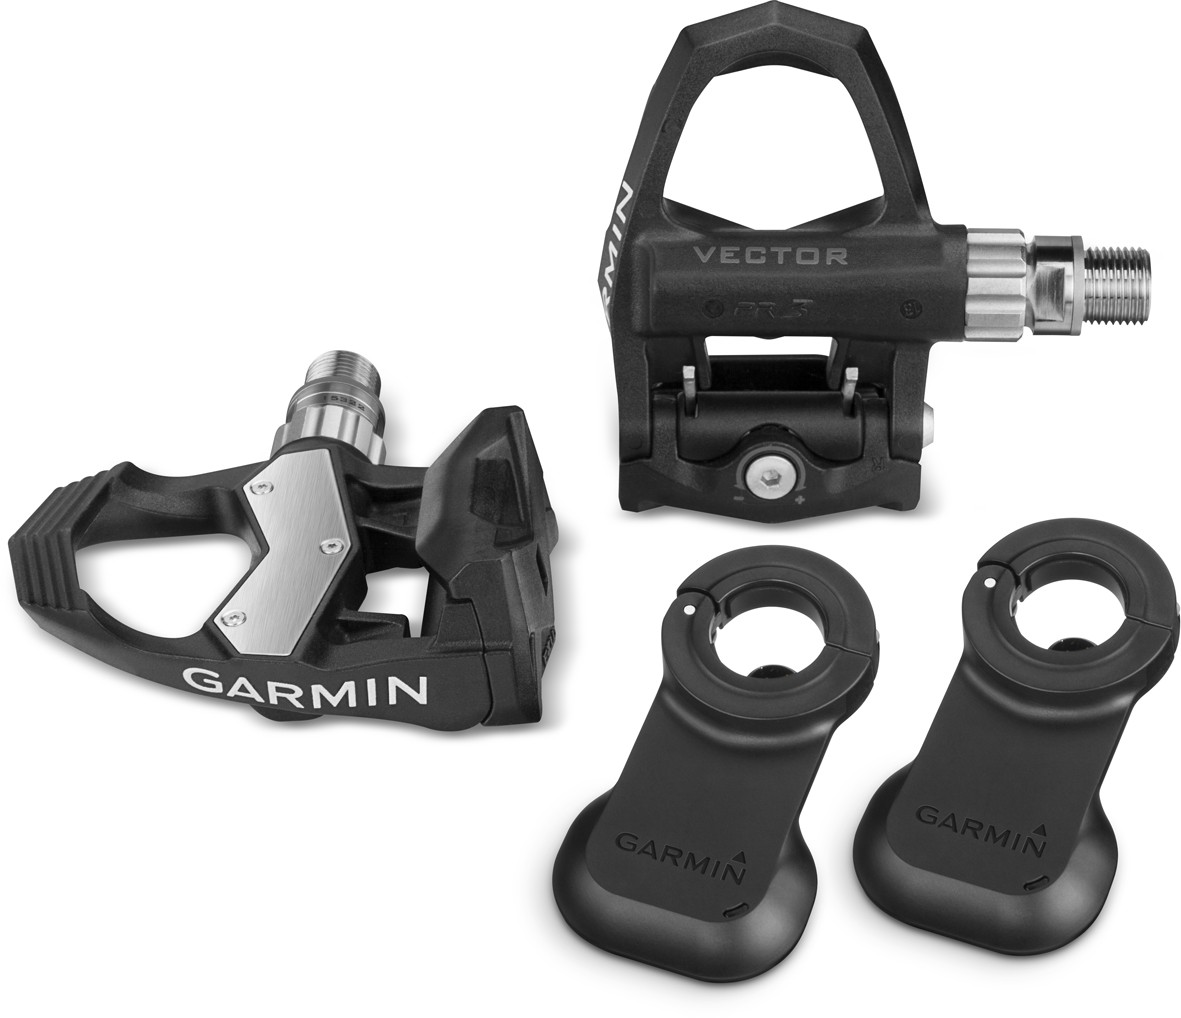 Garmin Vector 2 Pedal System